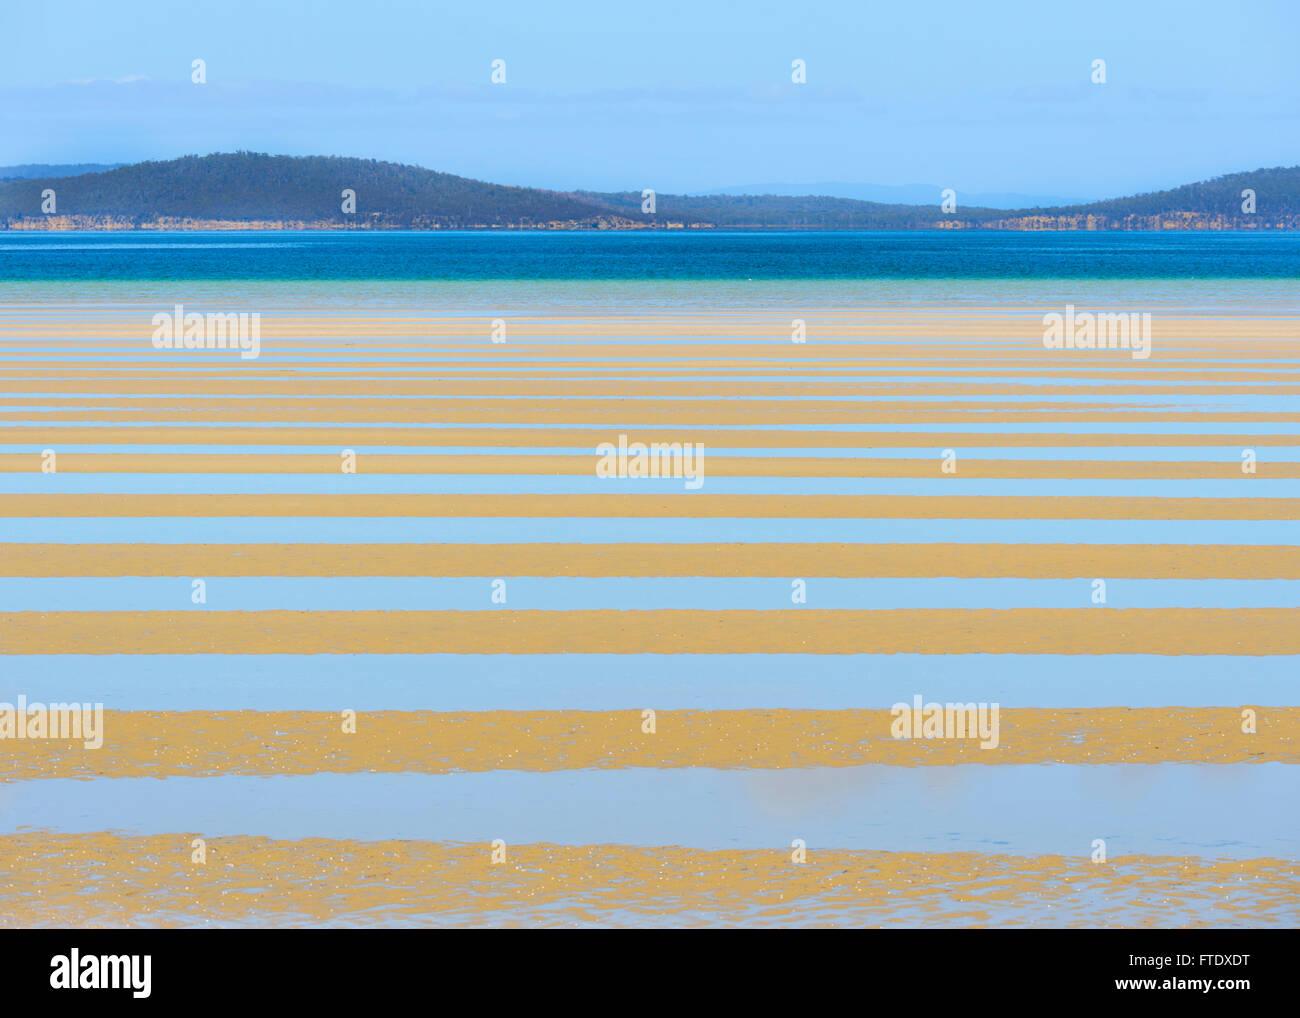 low-tide-near-sorrell-tasman-peninsula-tasmania-australia-FTDXDT.jpg